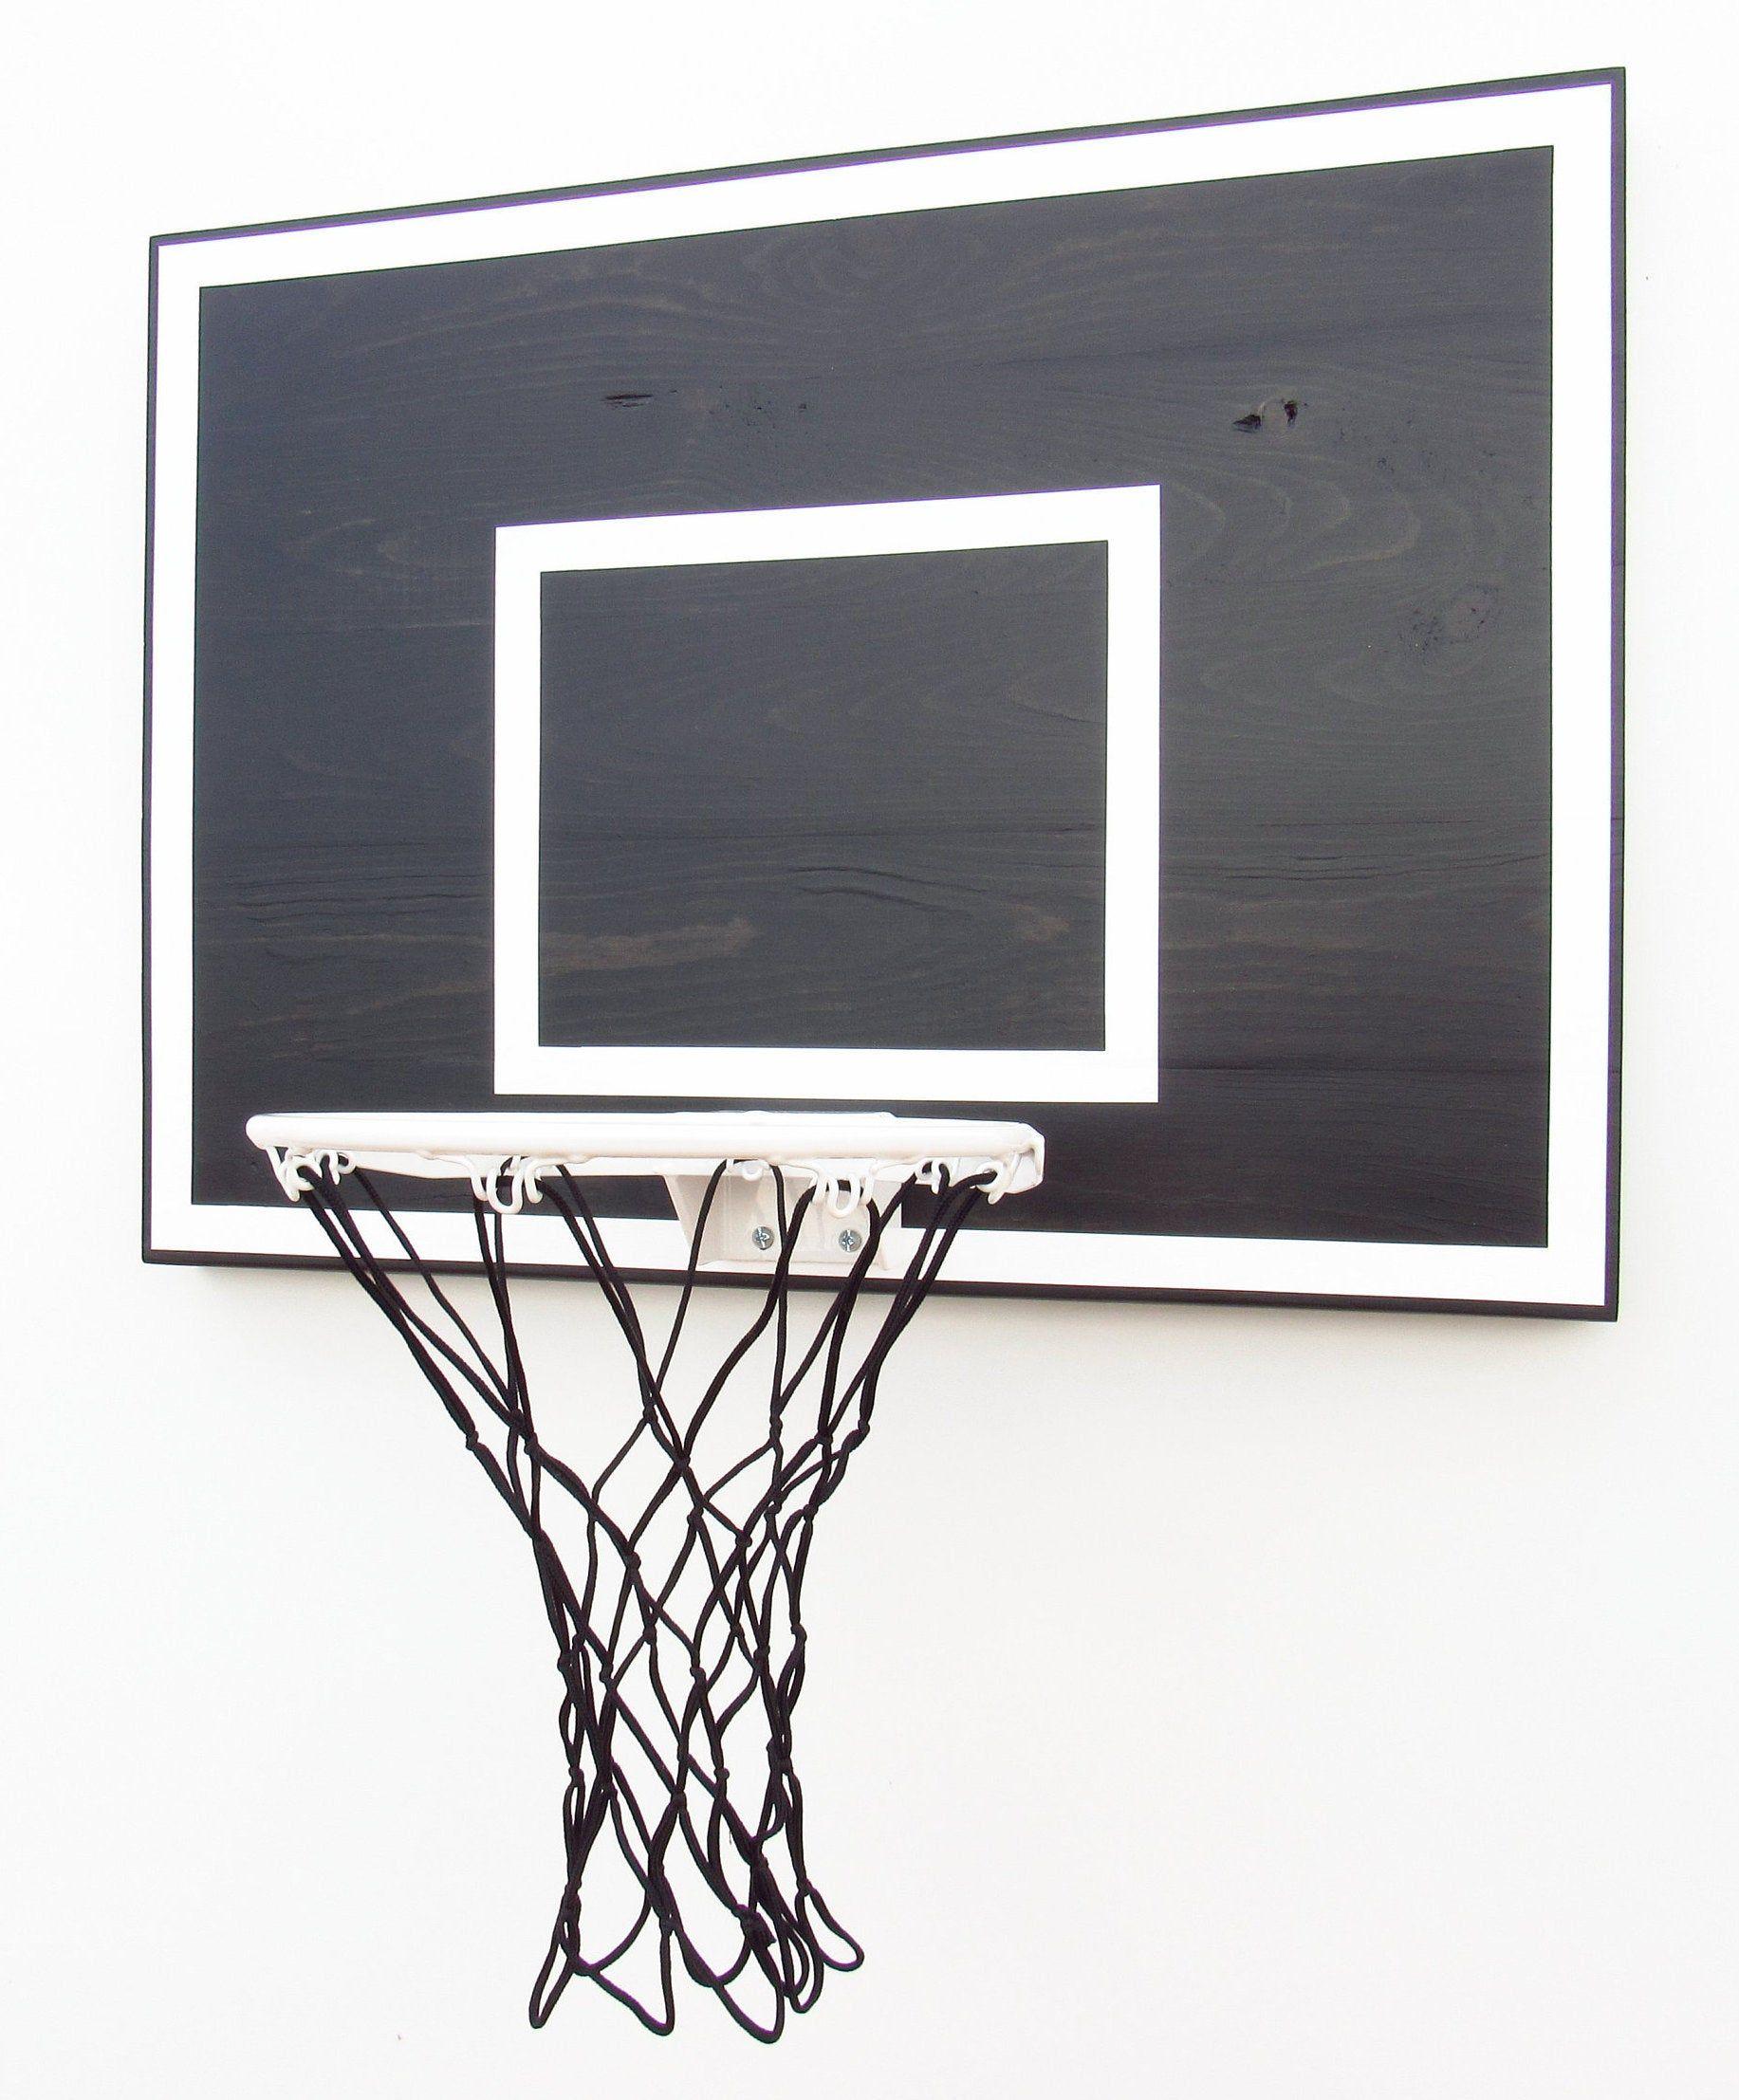 Indoor Basketball Hoops Never Looked So Good Https Etsy Me 2sponyu Blackandwhite Basketball Basketball Hoop Basketball Decorations Indoor Basketball Hoop